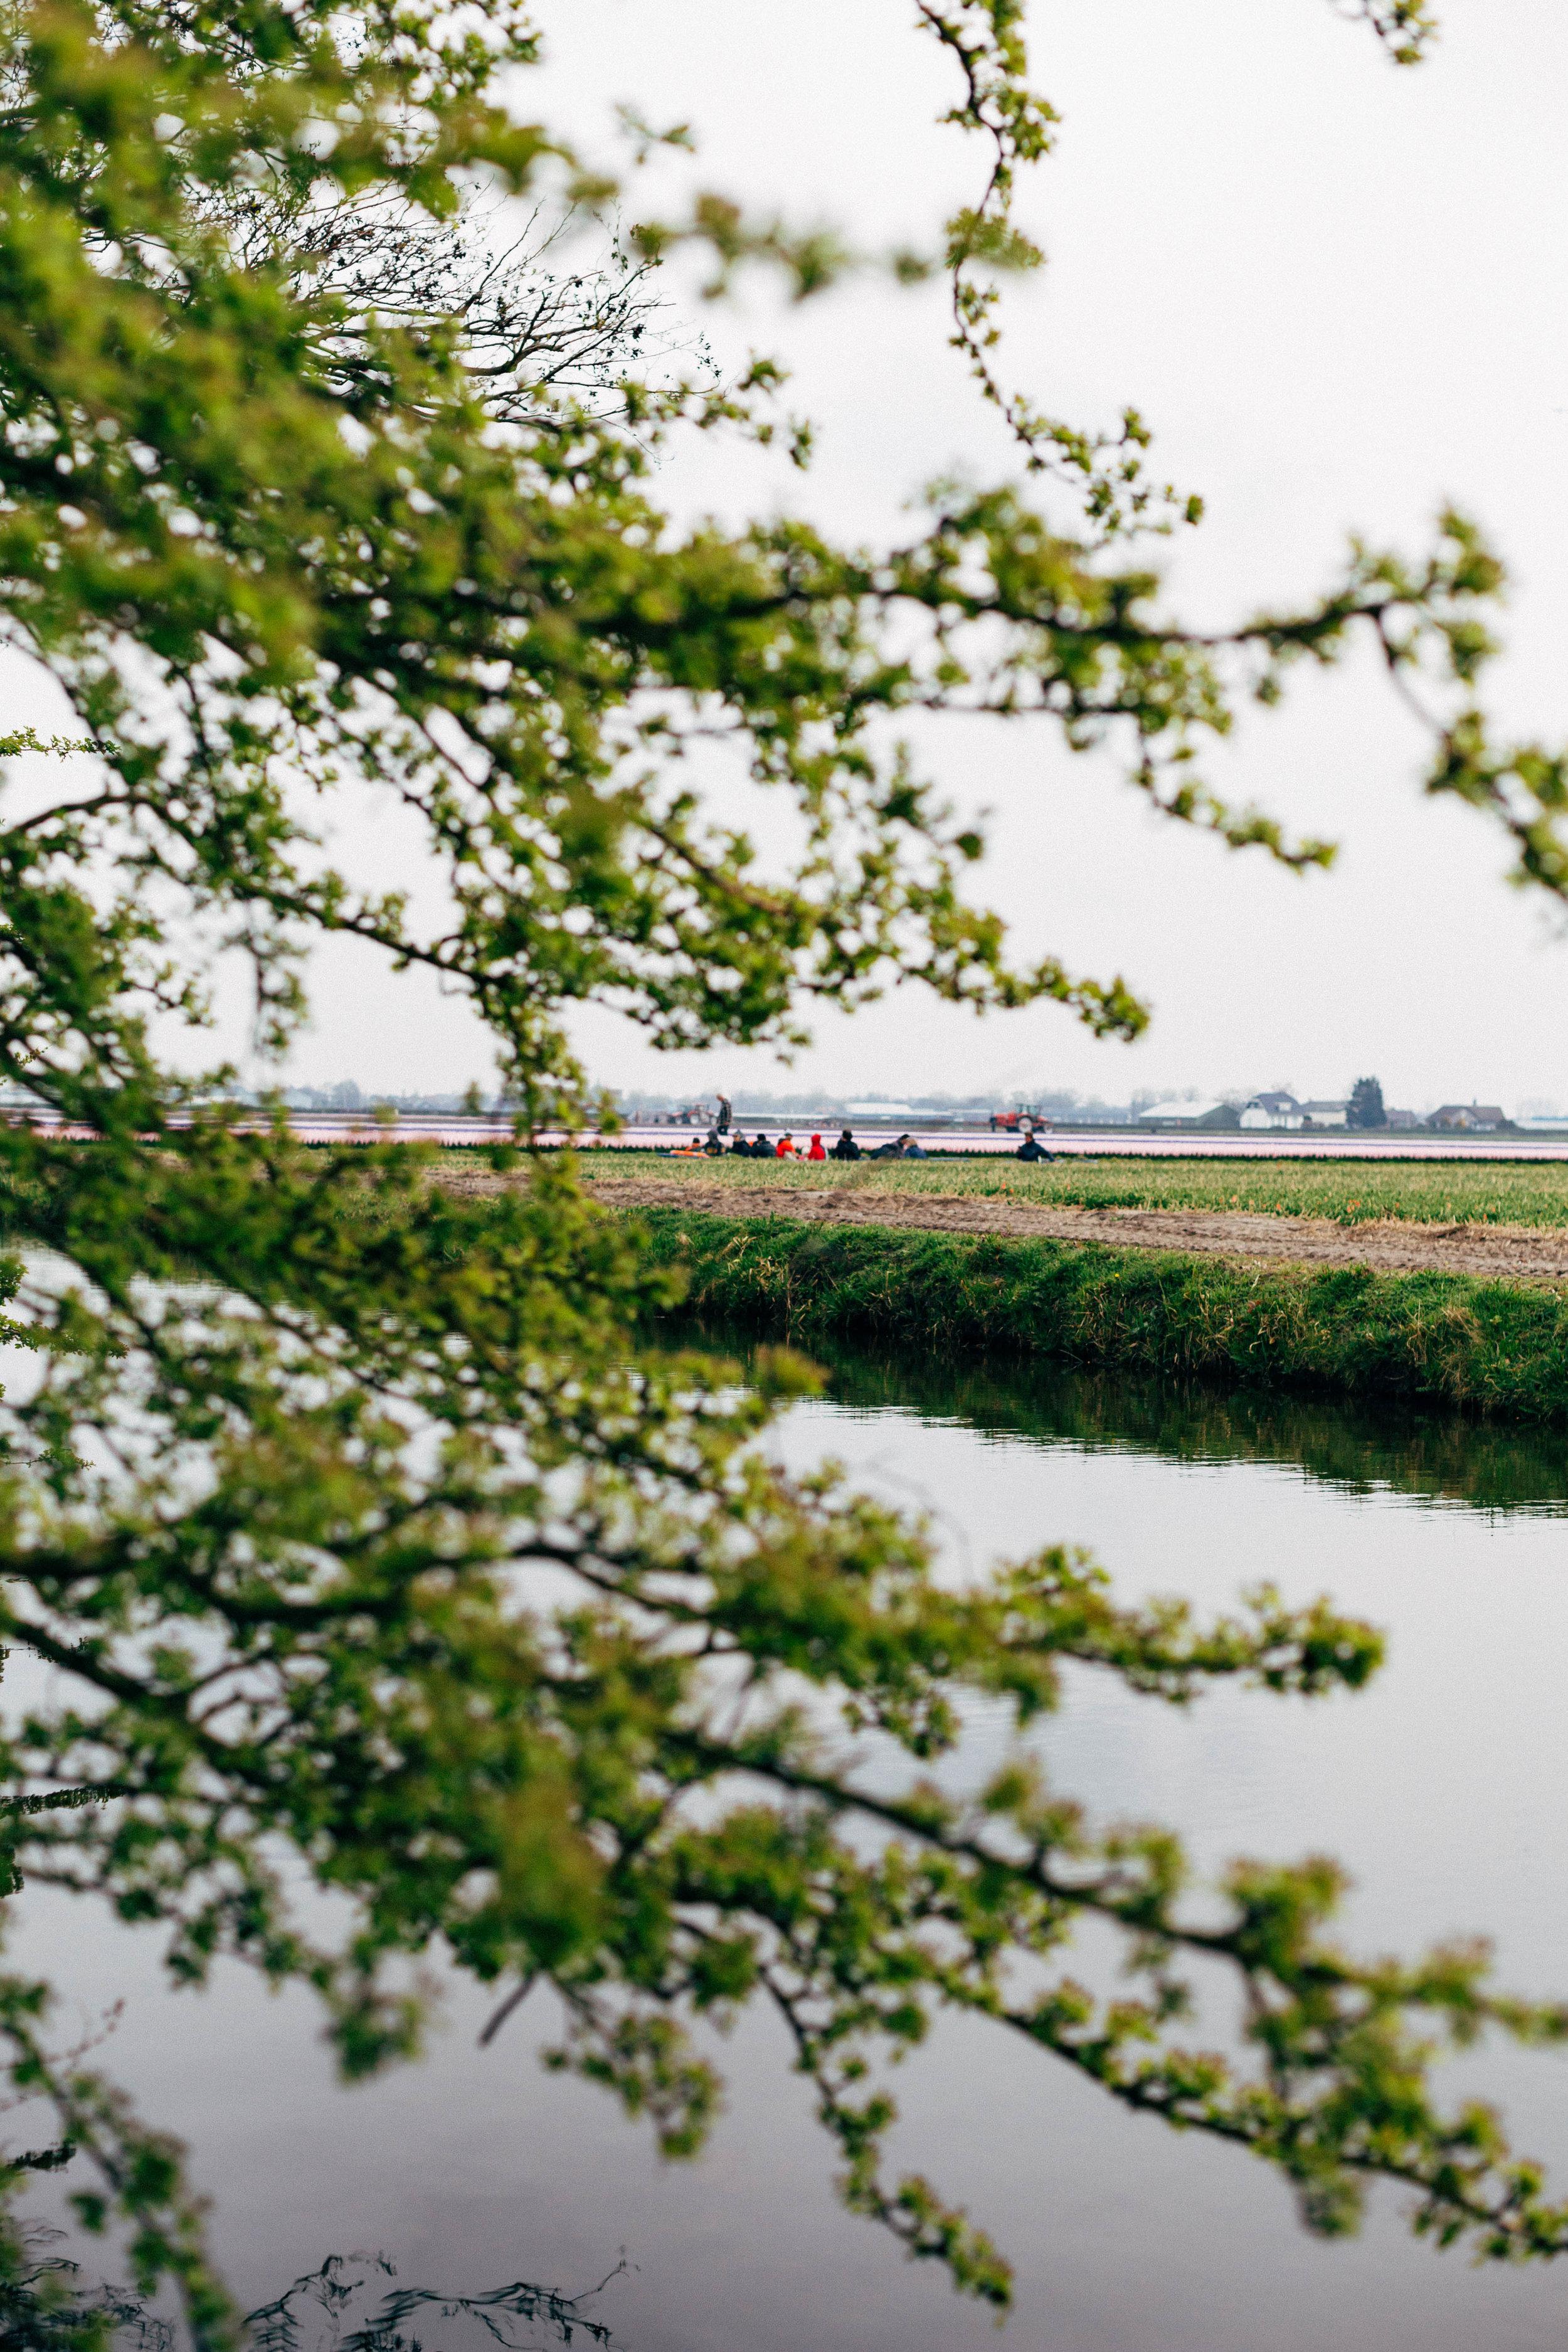 people-canal-boat-keukenhof-distance